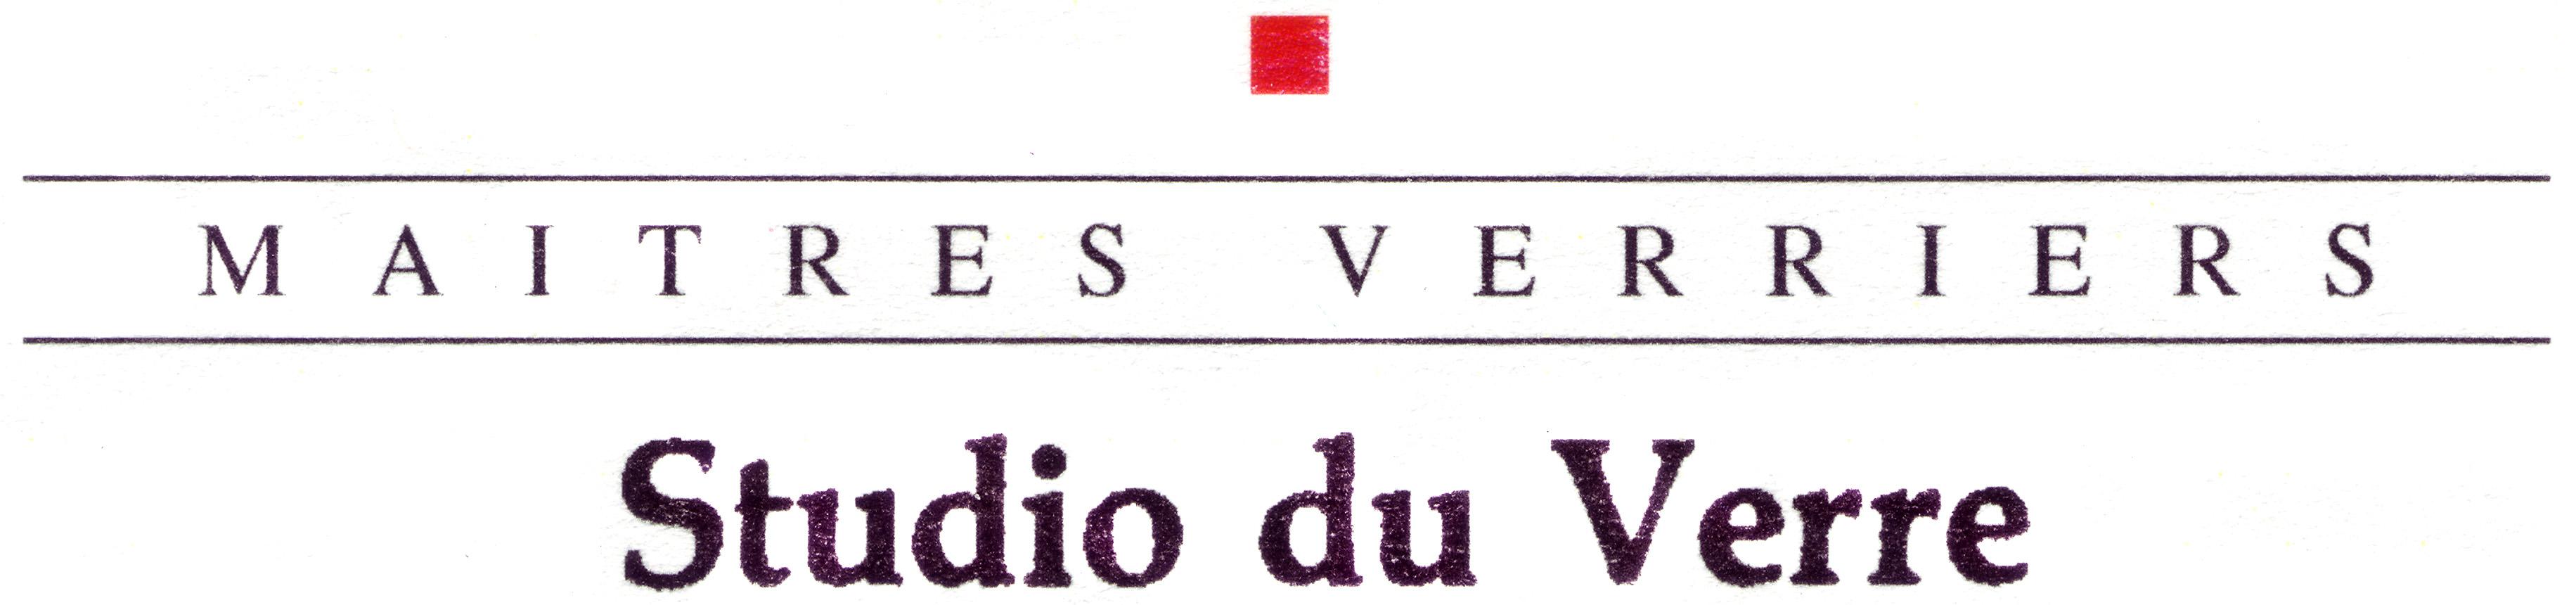 Studio du Verre 1200dpi